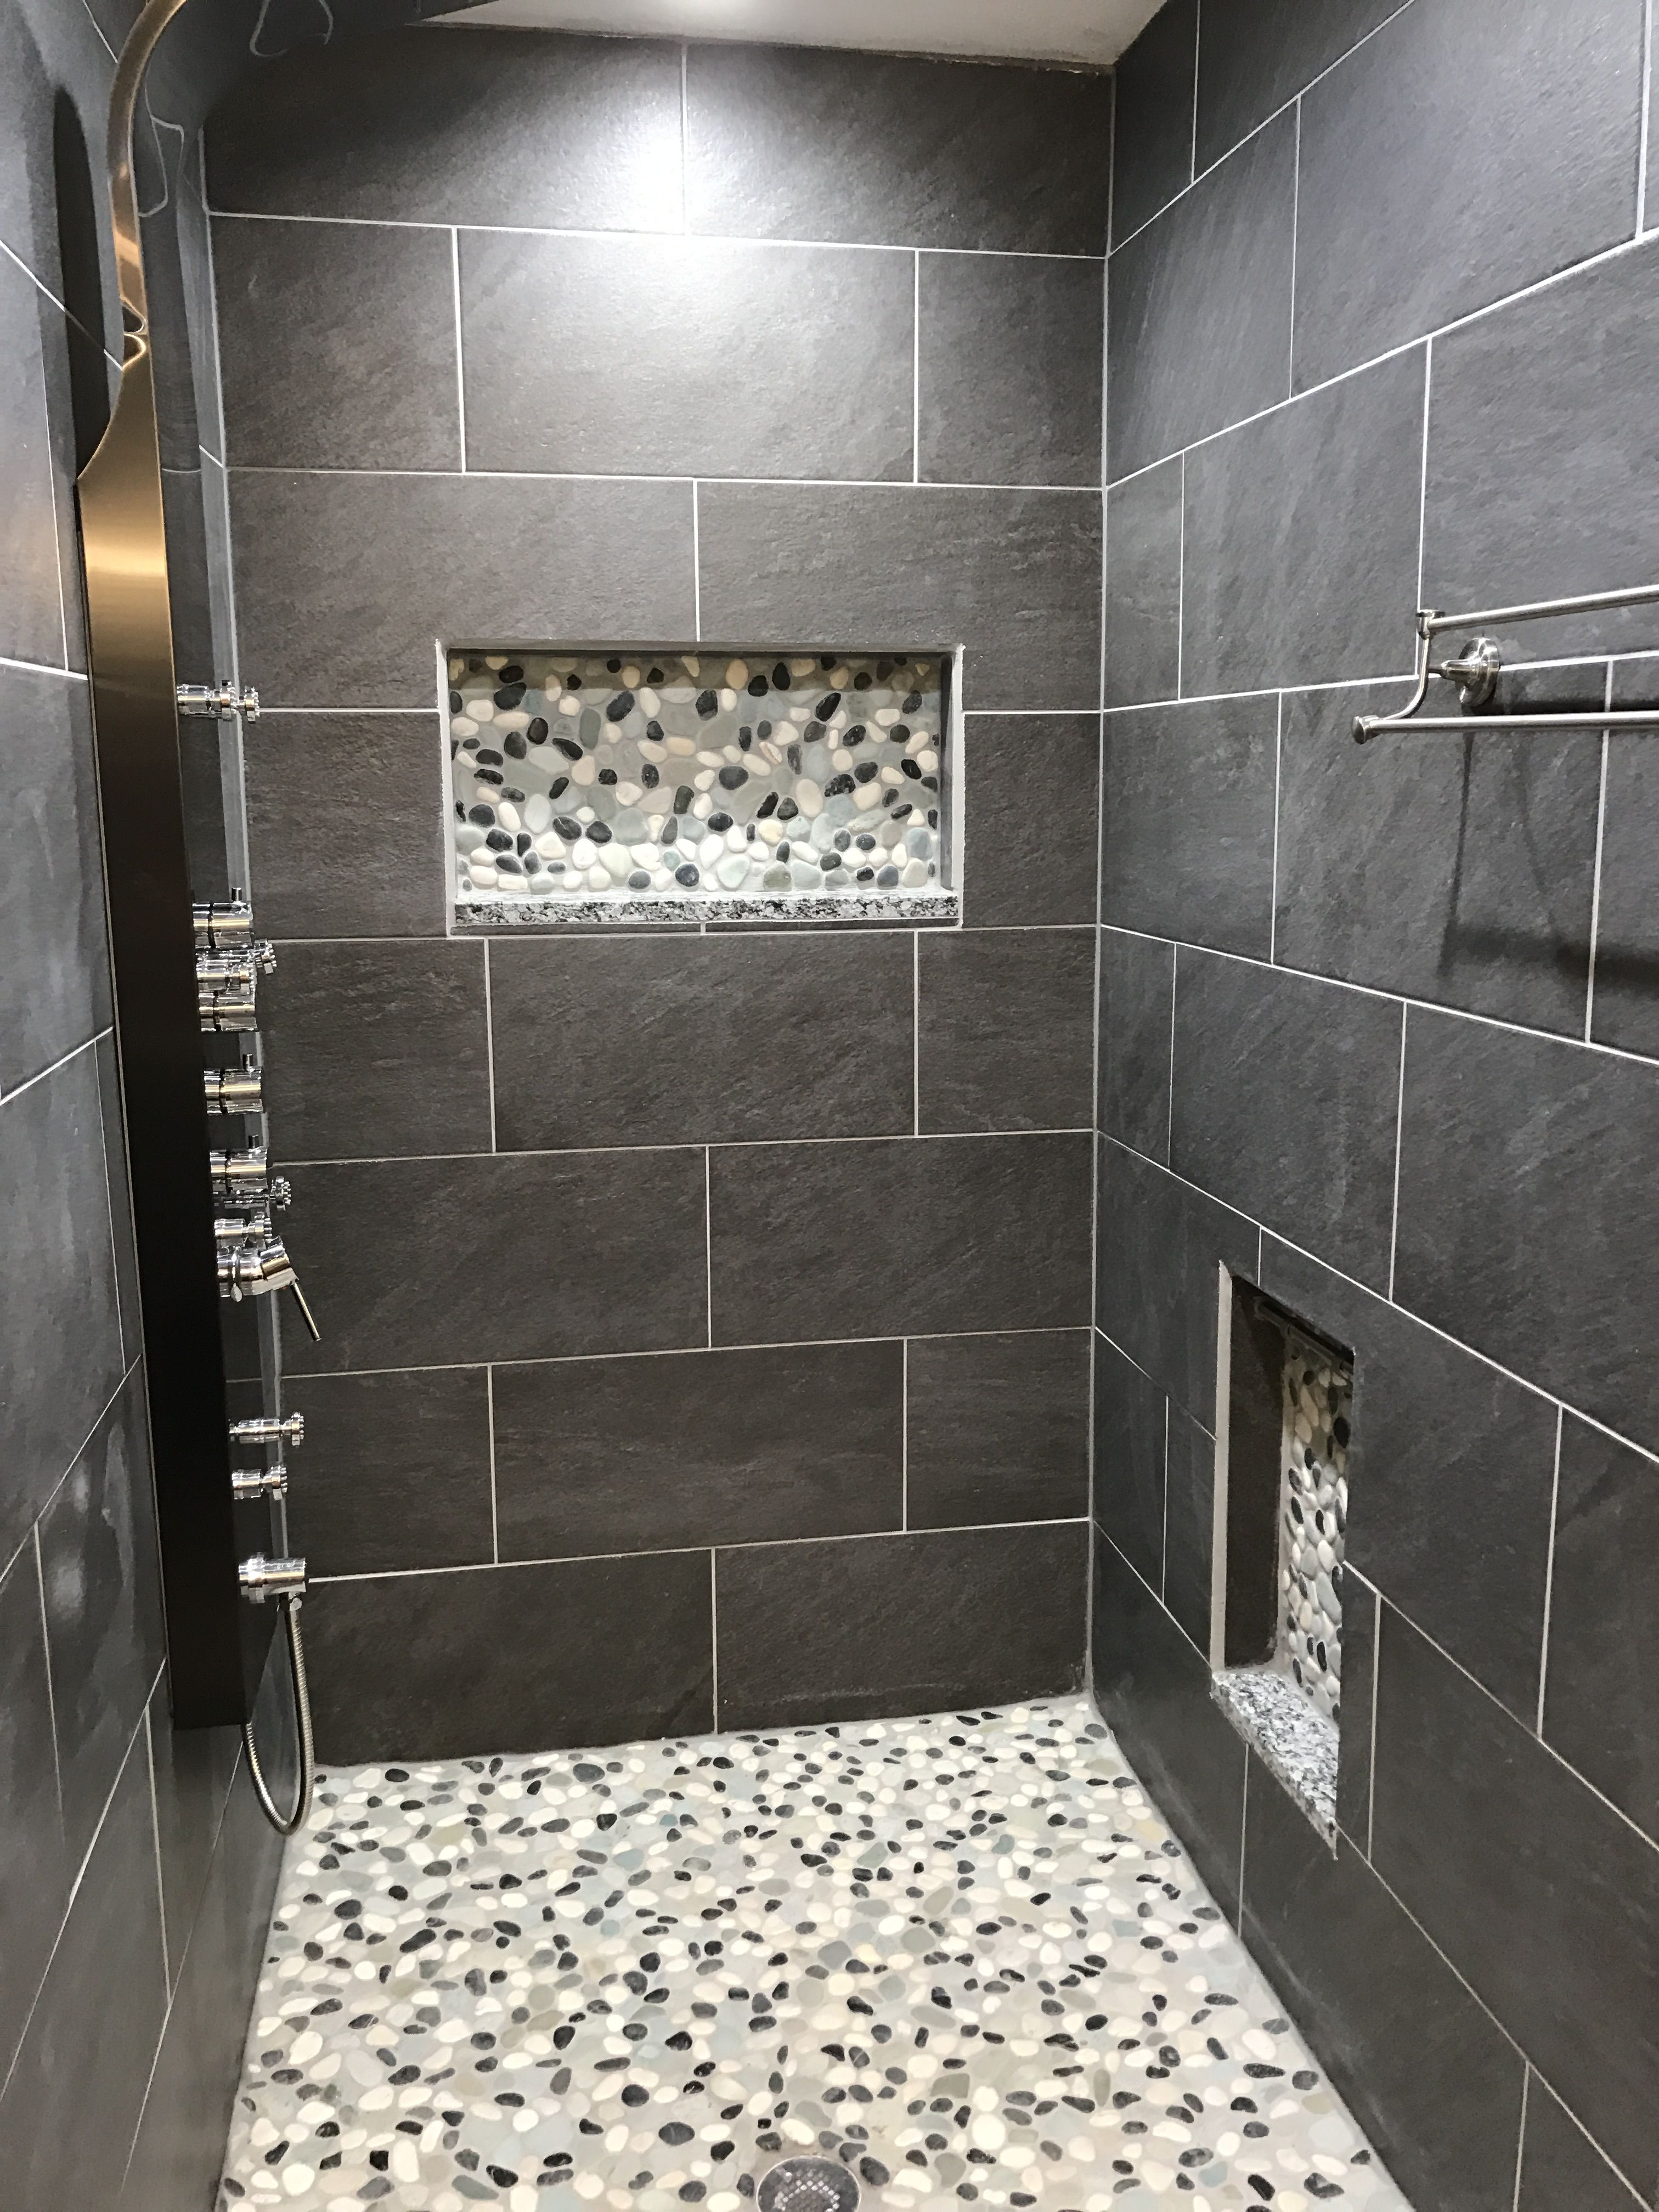 Bali Turtle Pebble Tile Tile Shower Pan Pebble Tile Shower and